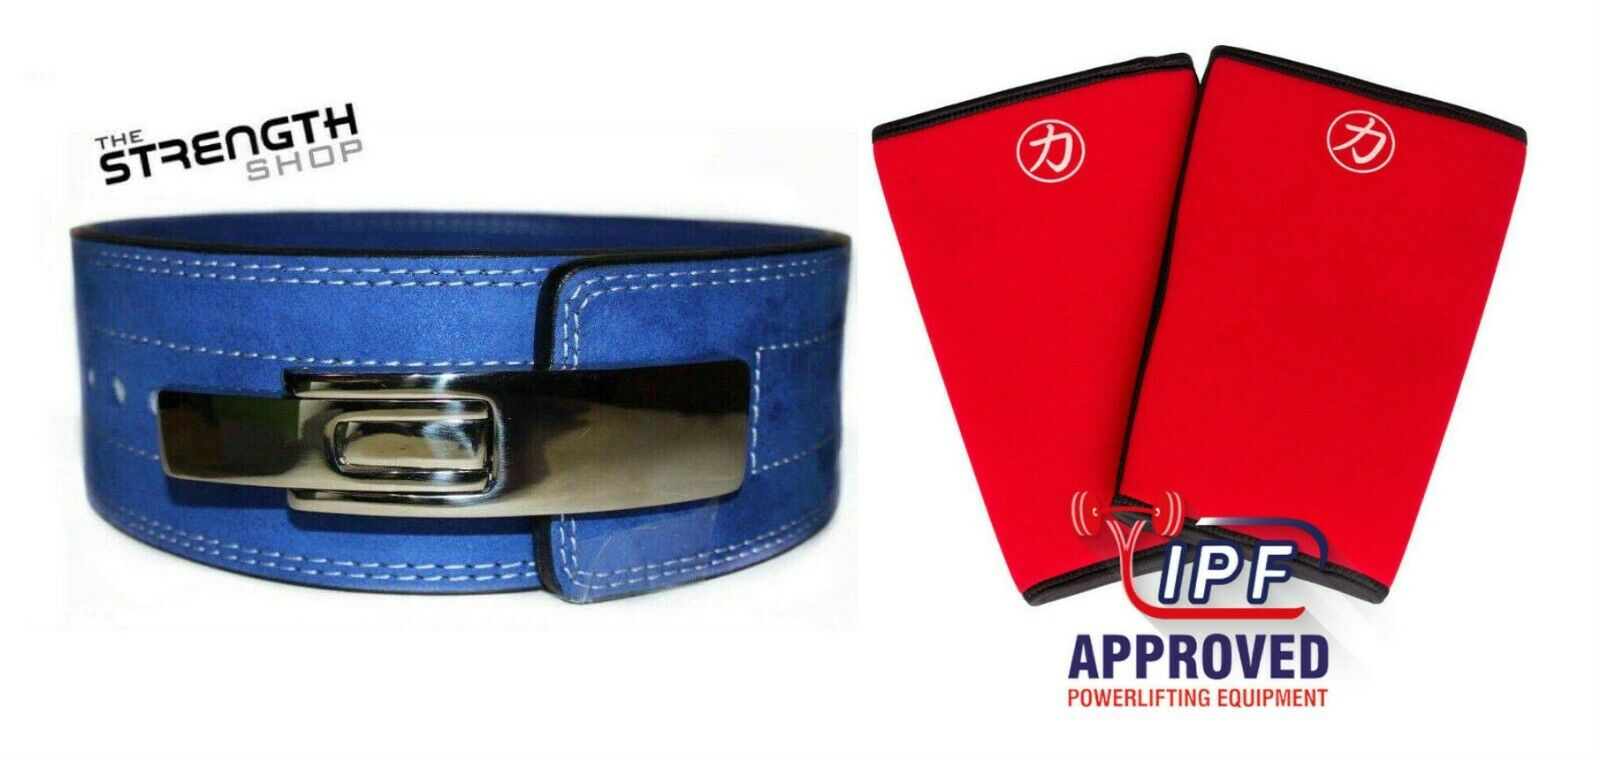 Strength Shop 10MM blu POWERLIFTING  LEVER BELT LARGE  INFERNO Knee Sleeves  shopping online di moda